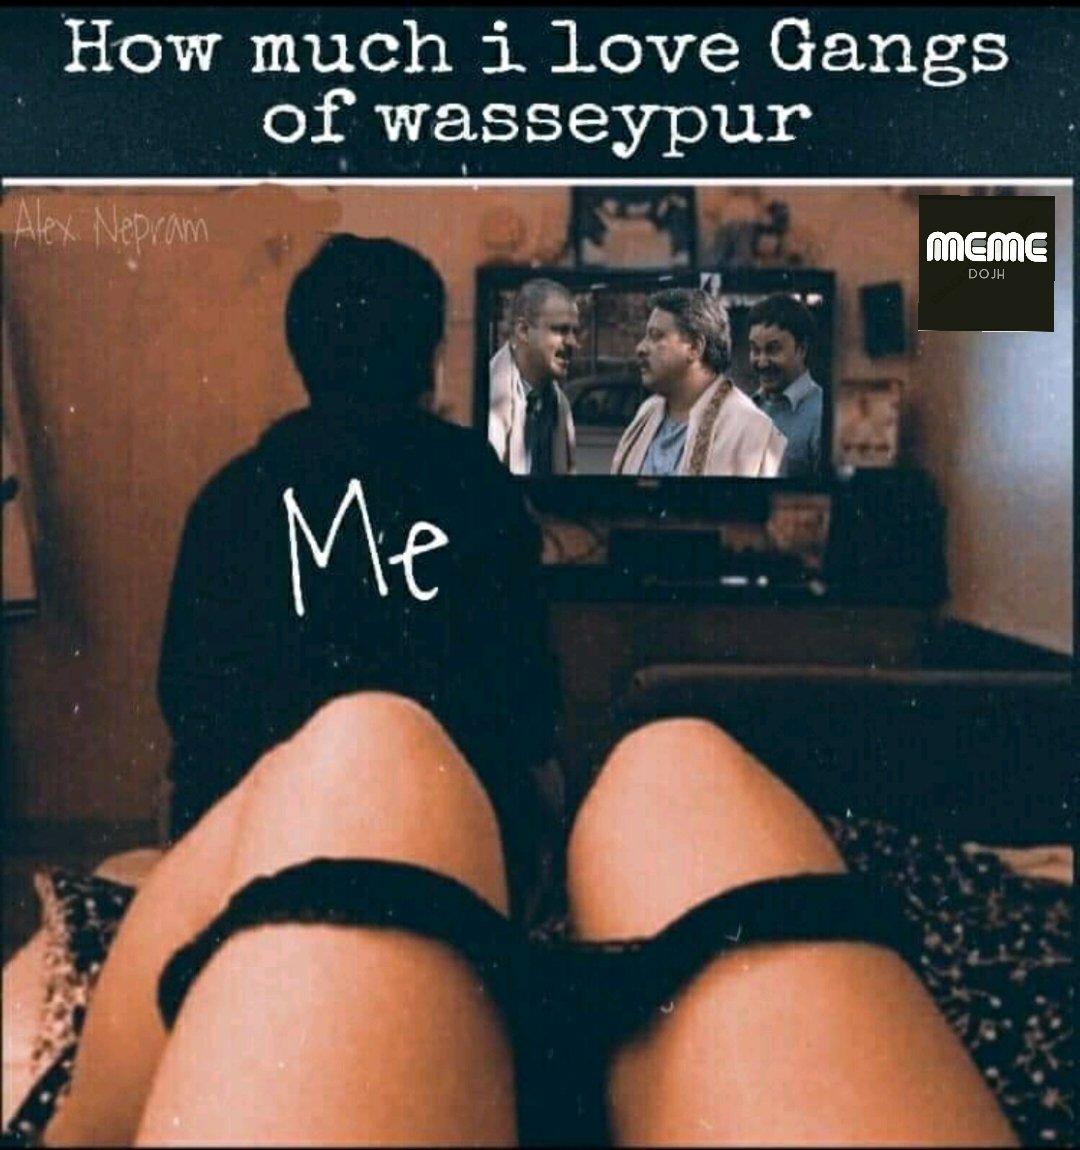 How much I love Wasseypur  #memedojh #indianmemes #memes #meme #desimemes #bakchodi #memesdaily #funnymemes #sarcasm #dankmemes #bollywoodmemes #indianjokes #chutiyapa #funny #hindimemes #india #bakchod #trolls #indianmeme #follow #rvcjinsta #sarcasticmemes #bakchodiyaanpic.twitter.com/pExnPbSnwm